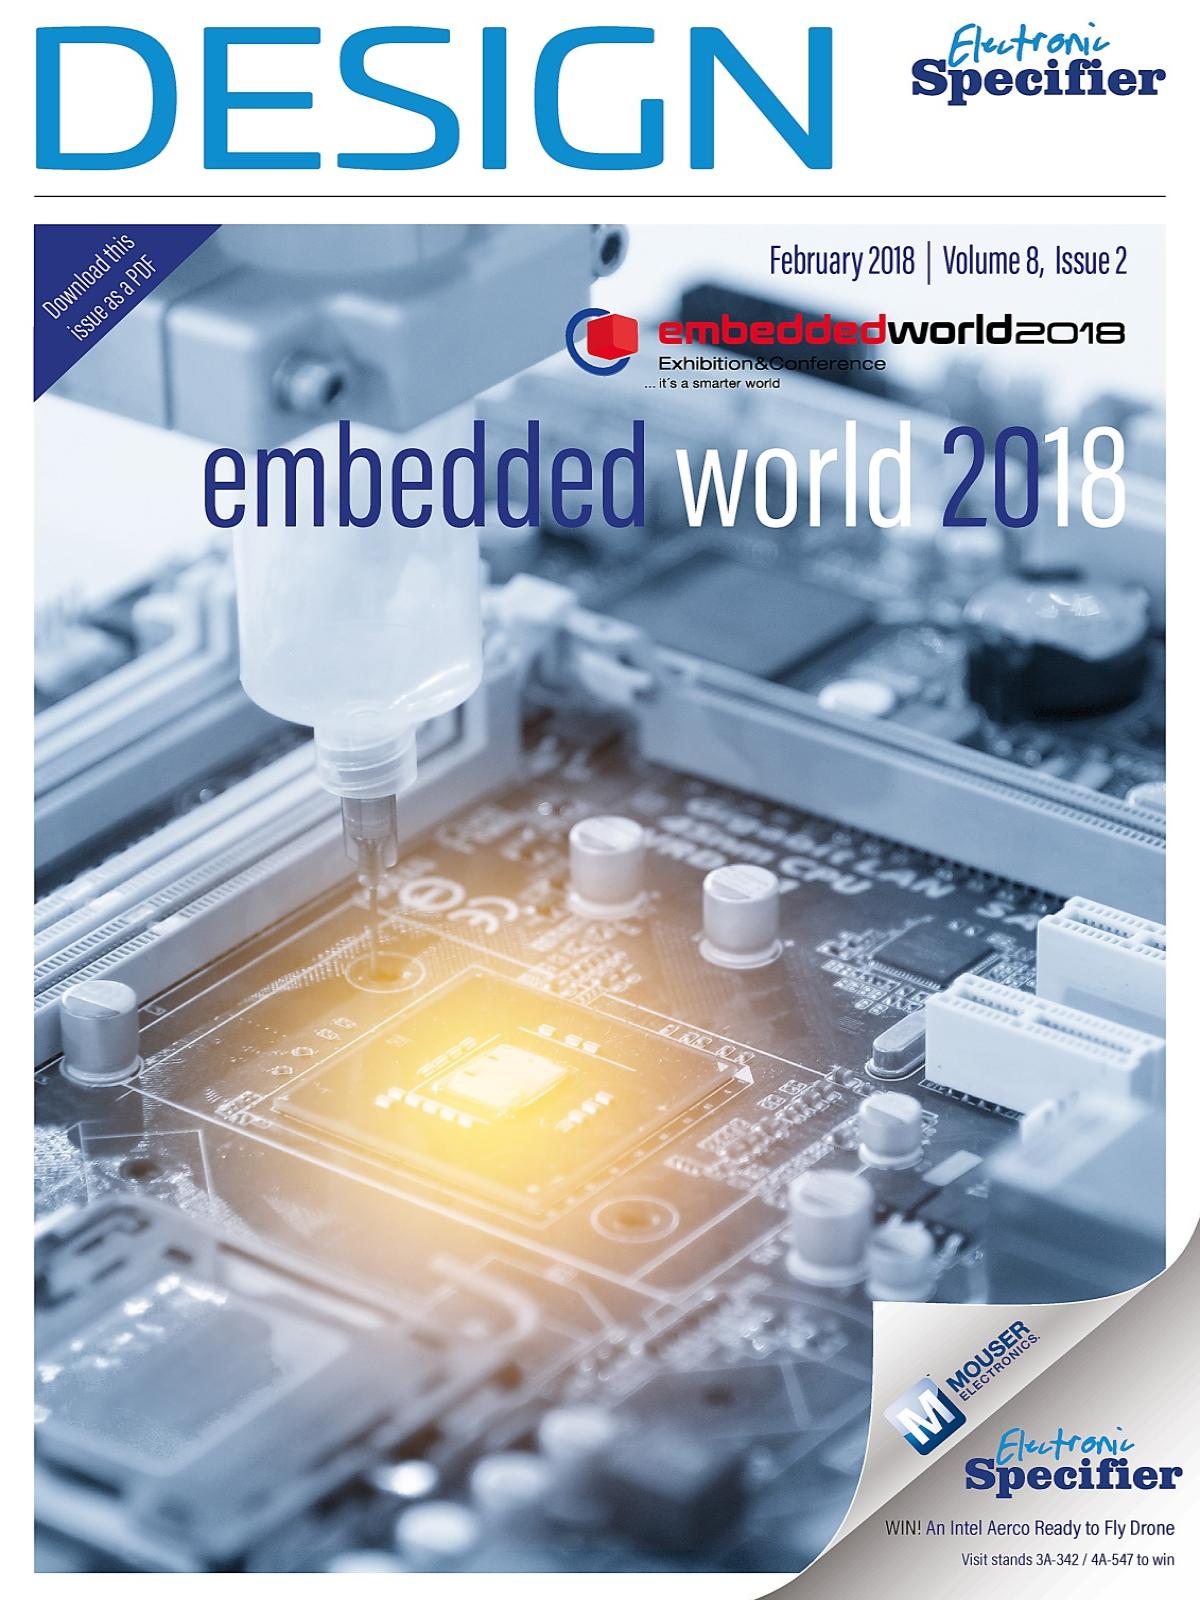 MYEBOOK - ESD February 2018 - embedded world